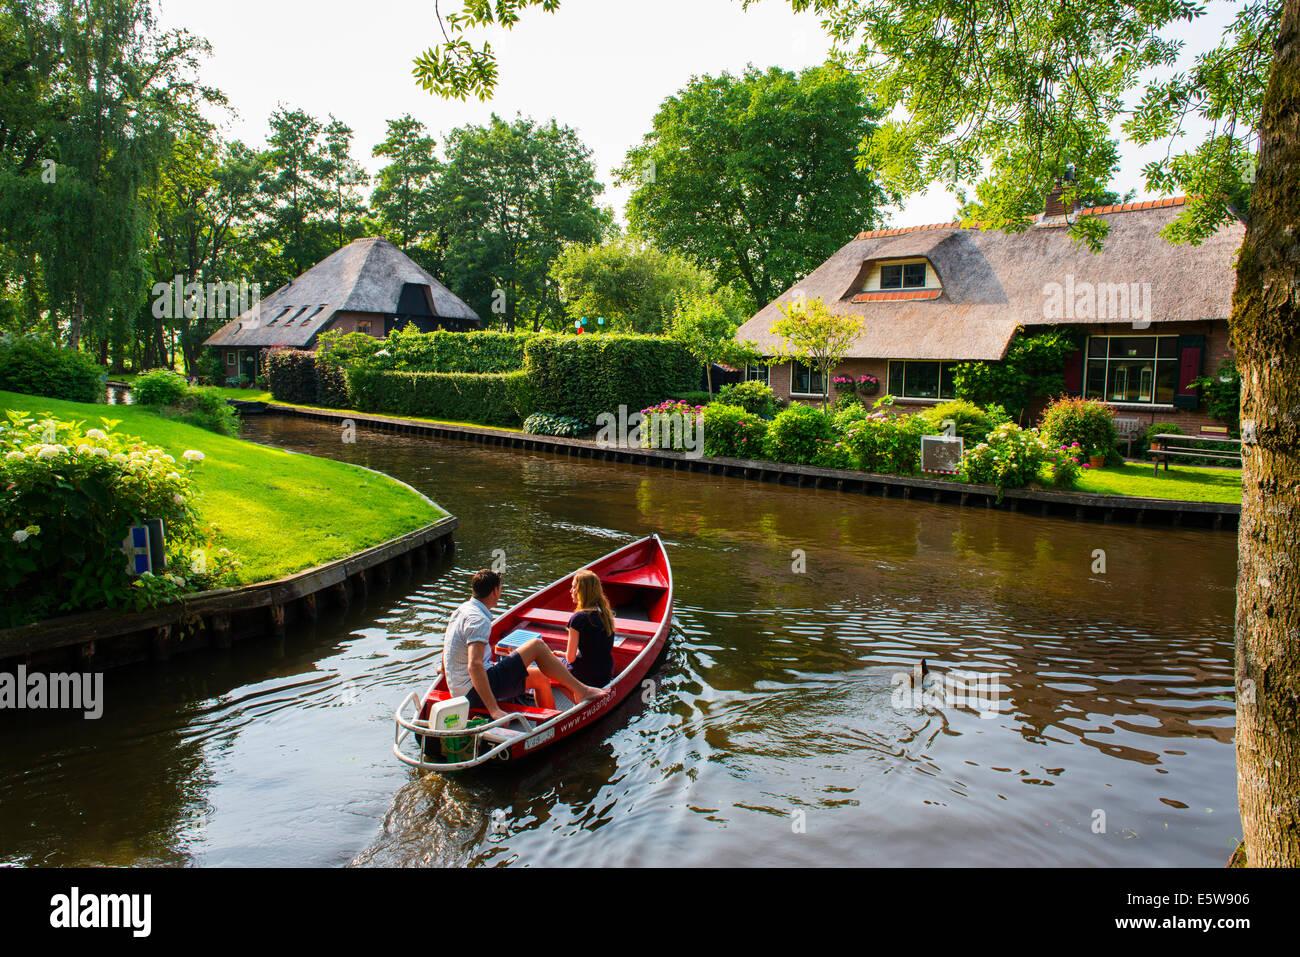 Giethoorn canals, Holland, netherlands - Stock Image